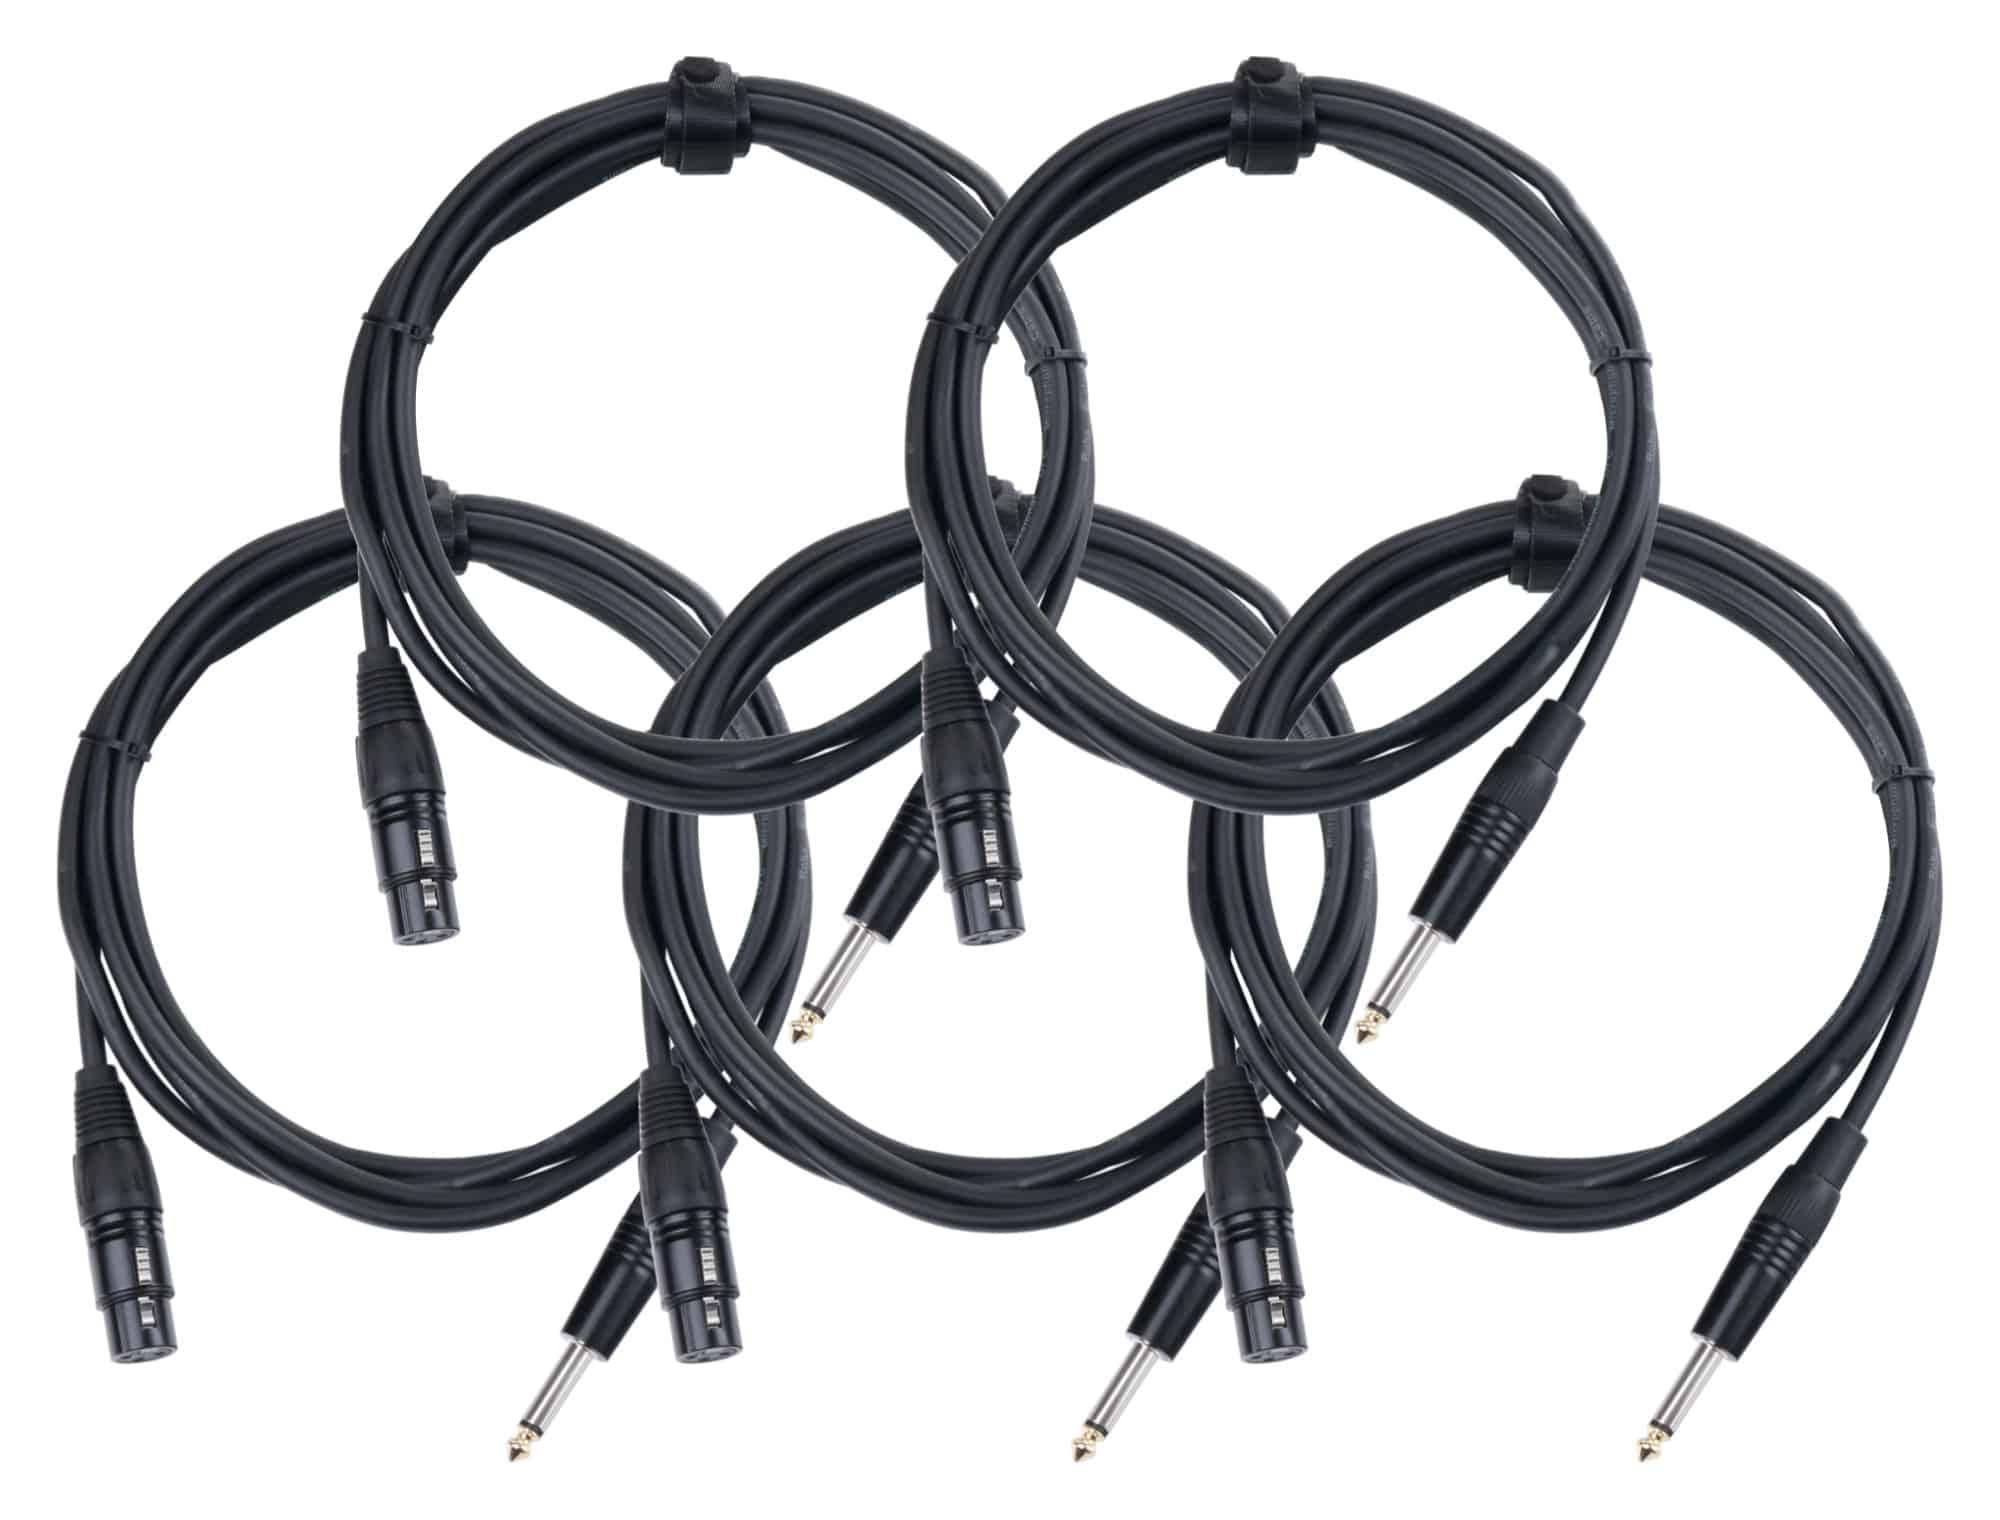 5er Set Pronomic Stage XFJ 2.5 Mikrofonkabel XLR|Klinke 2,5 m Schwarz